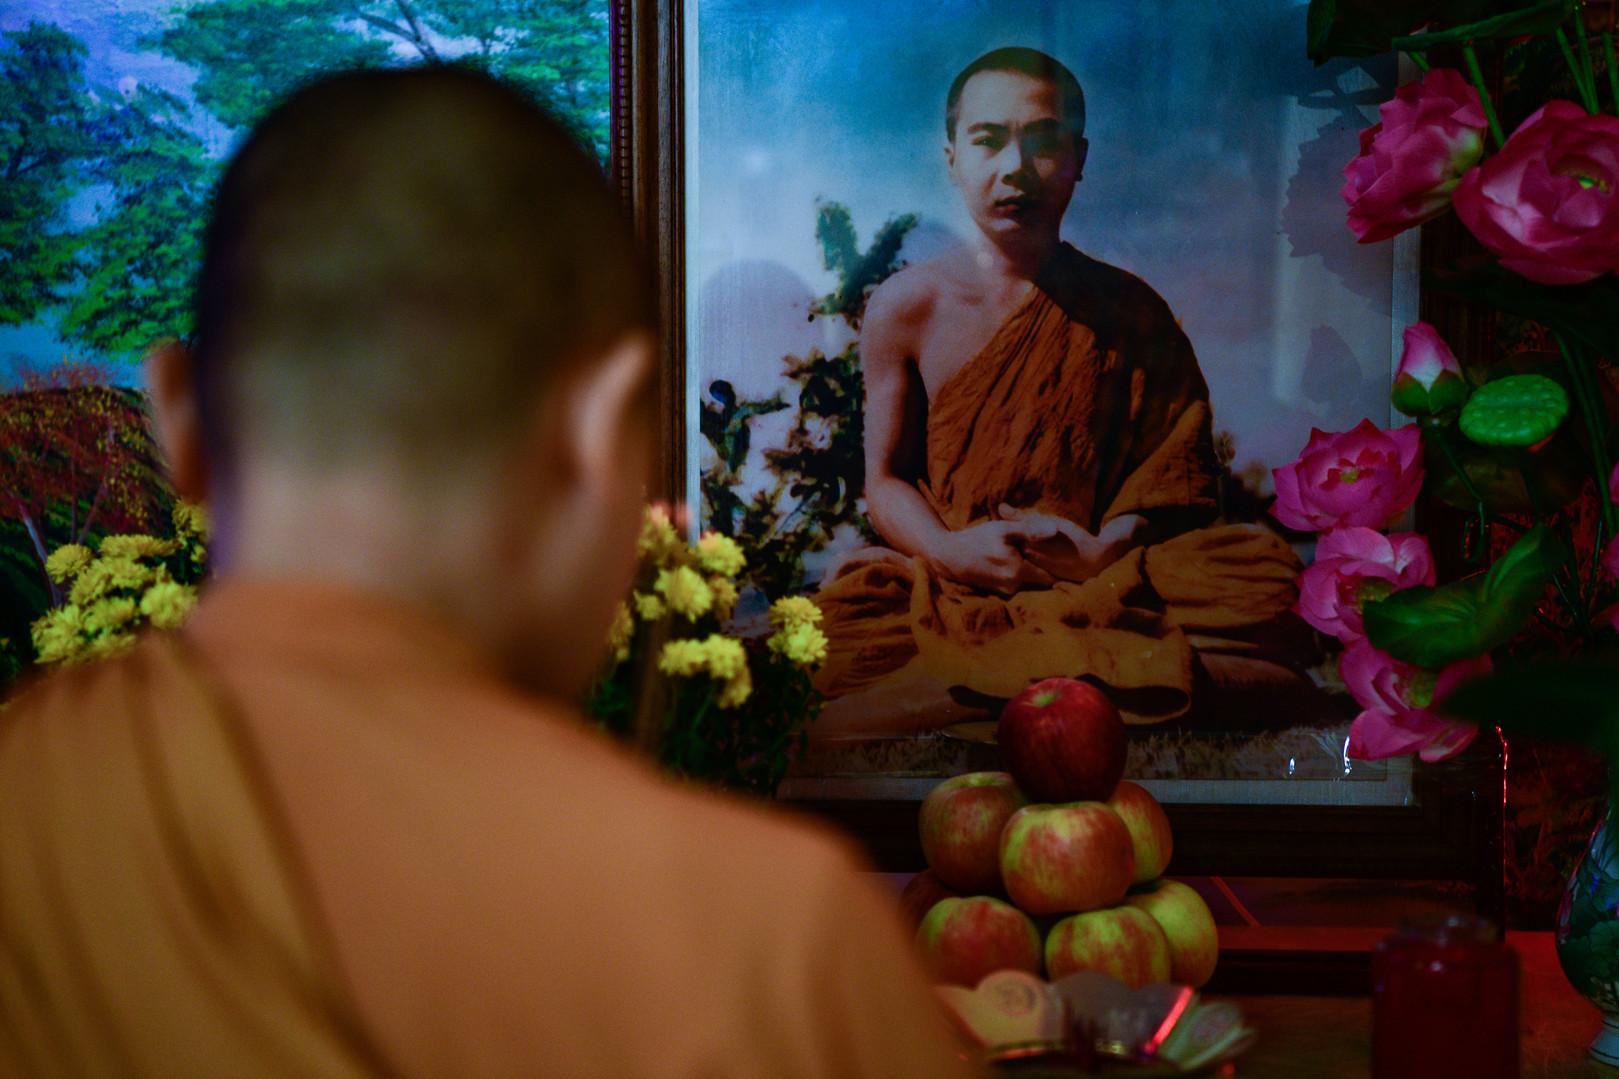 Ngoc Duyen temple story